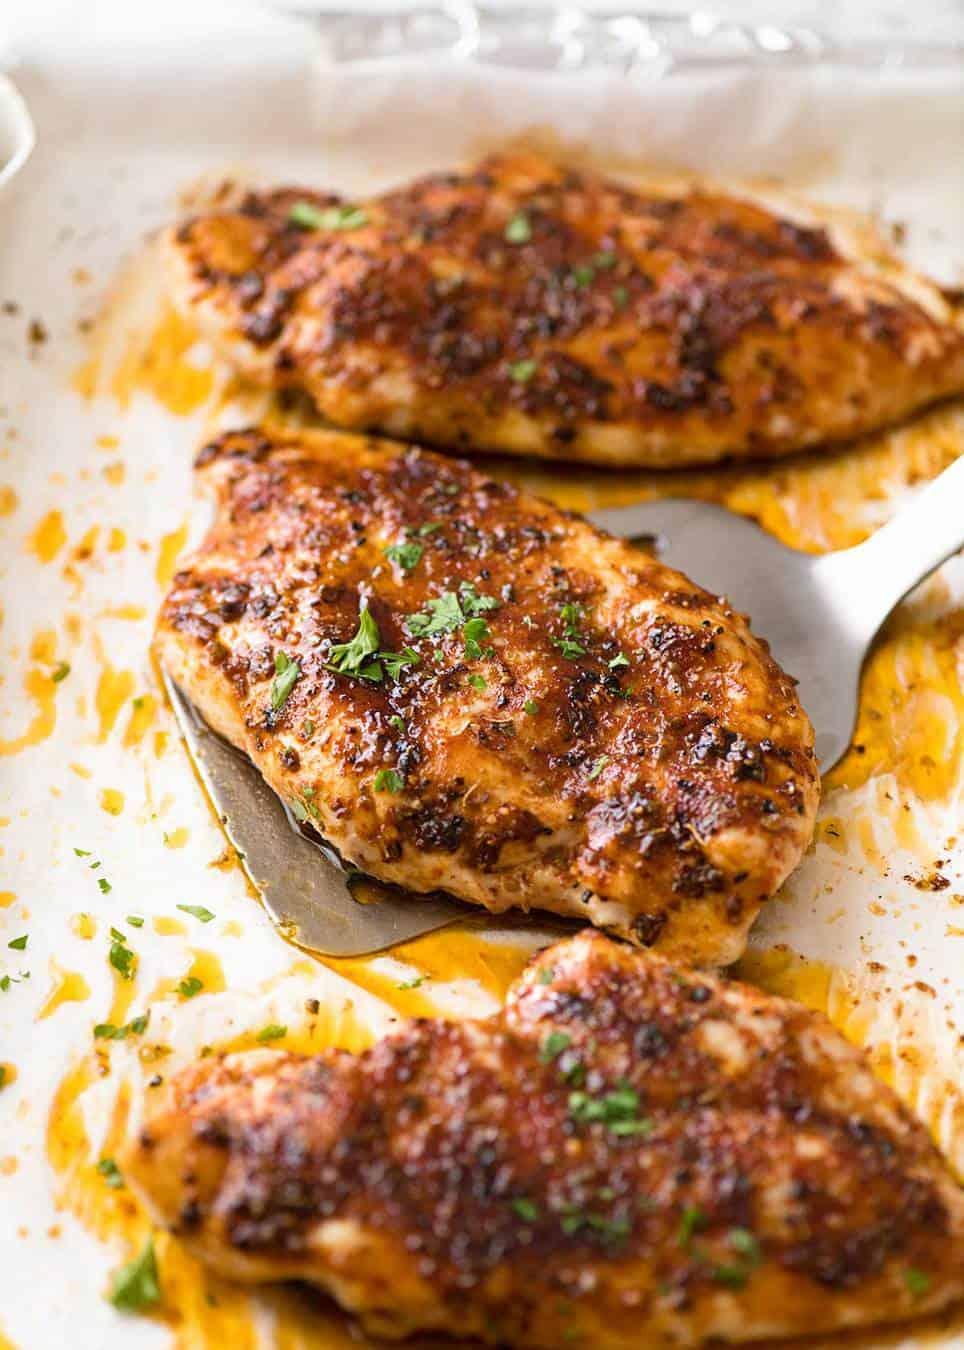 Oven Baked Chicken Breast | RecipeTin Eats